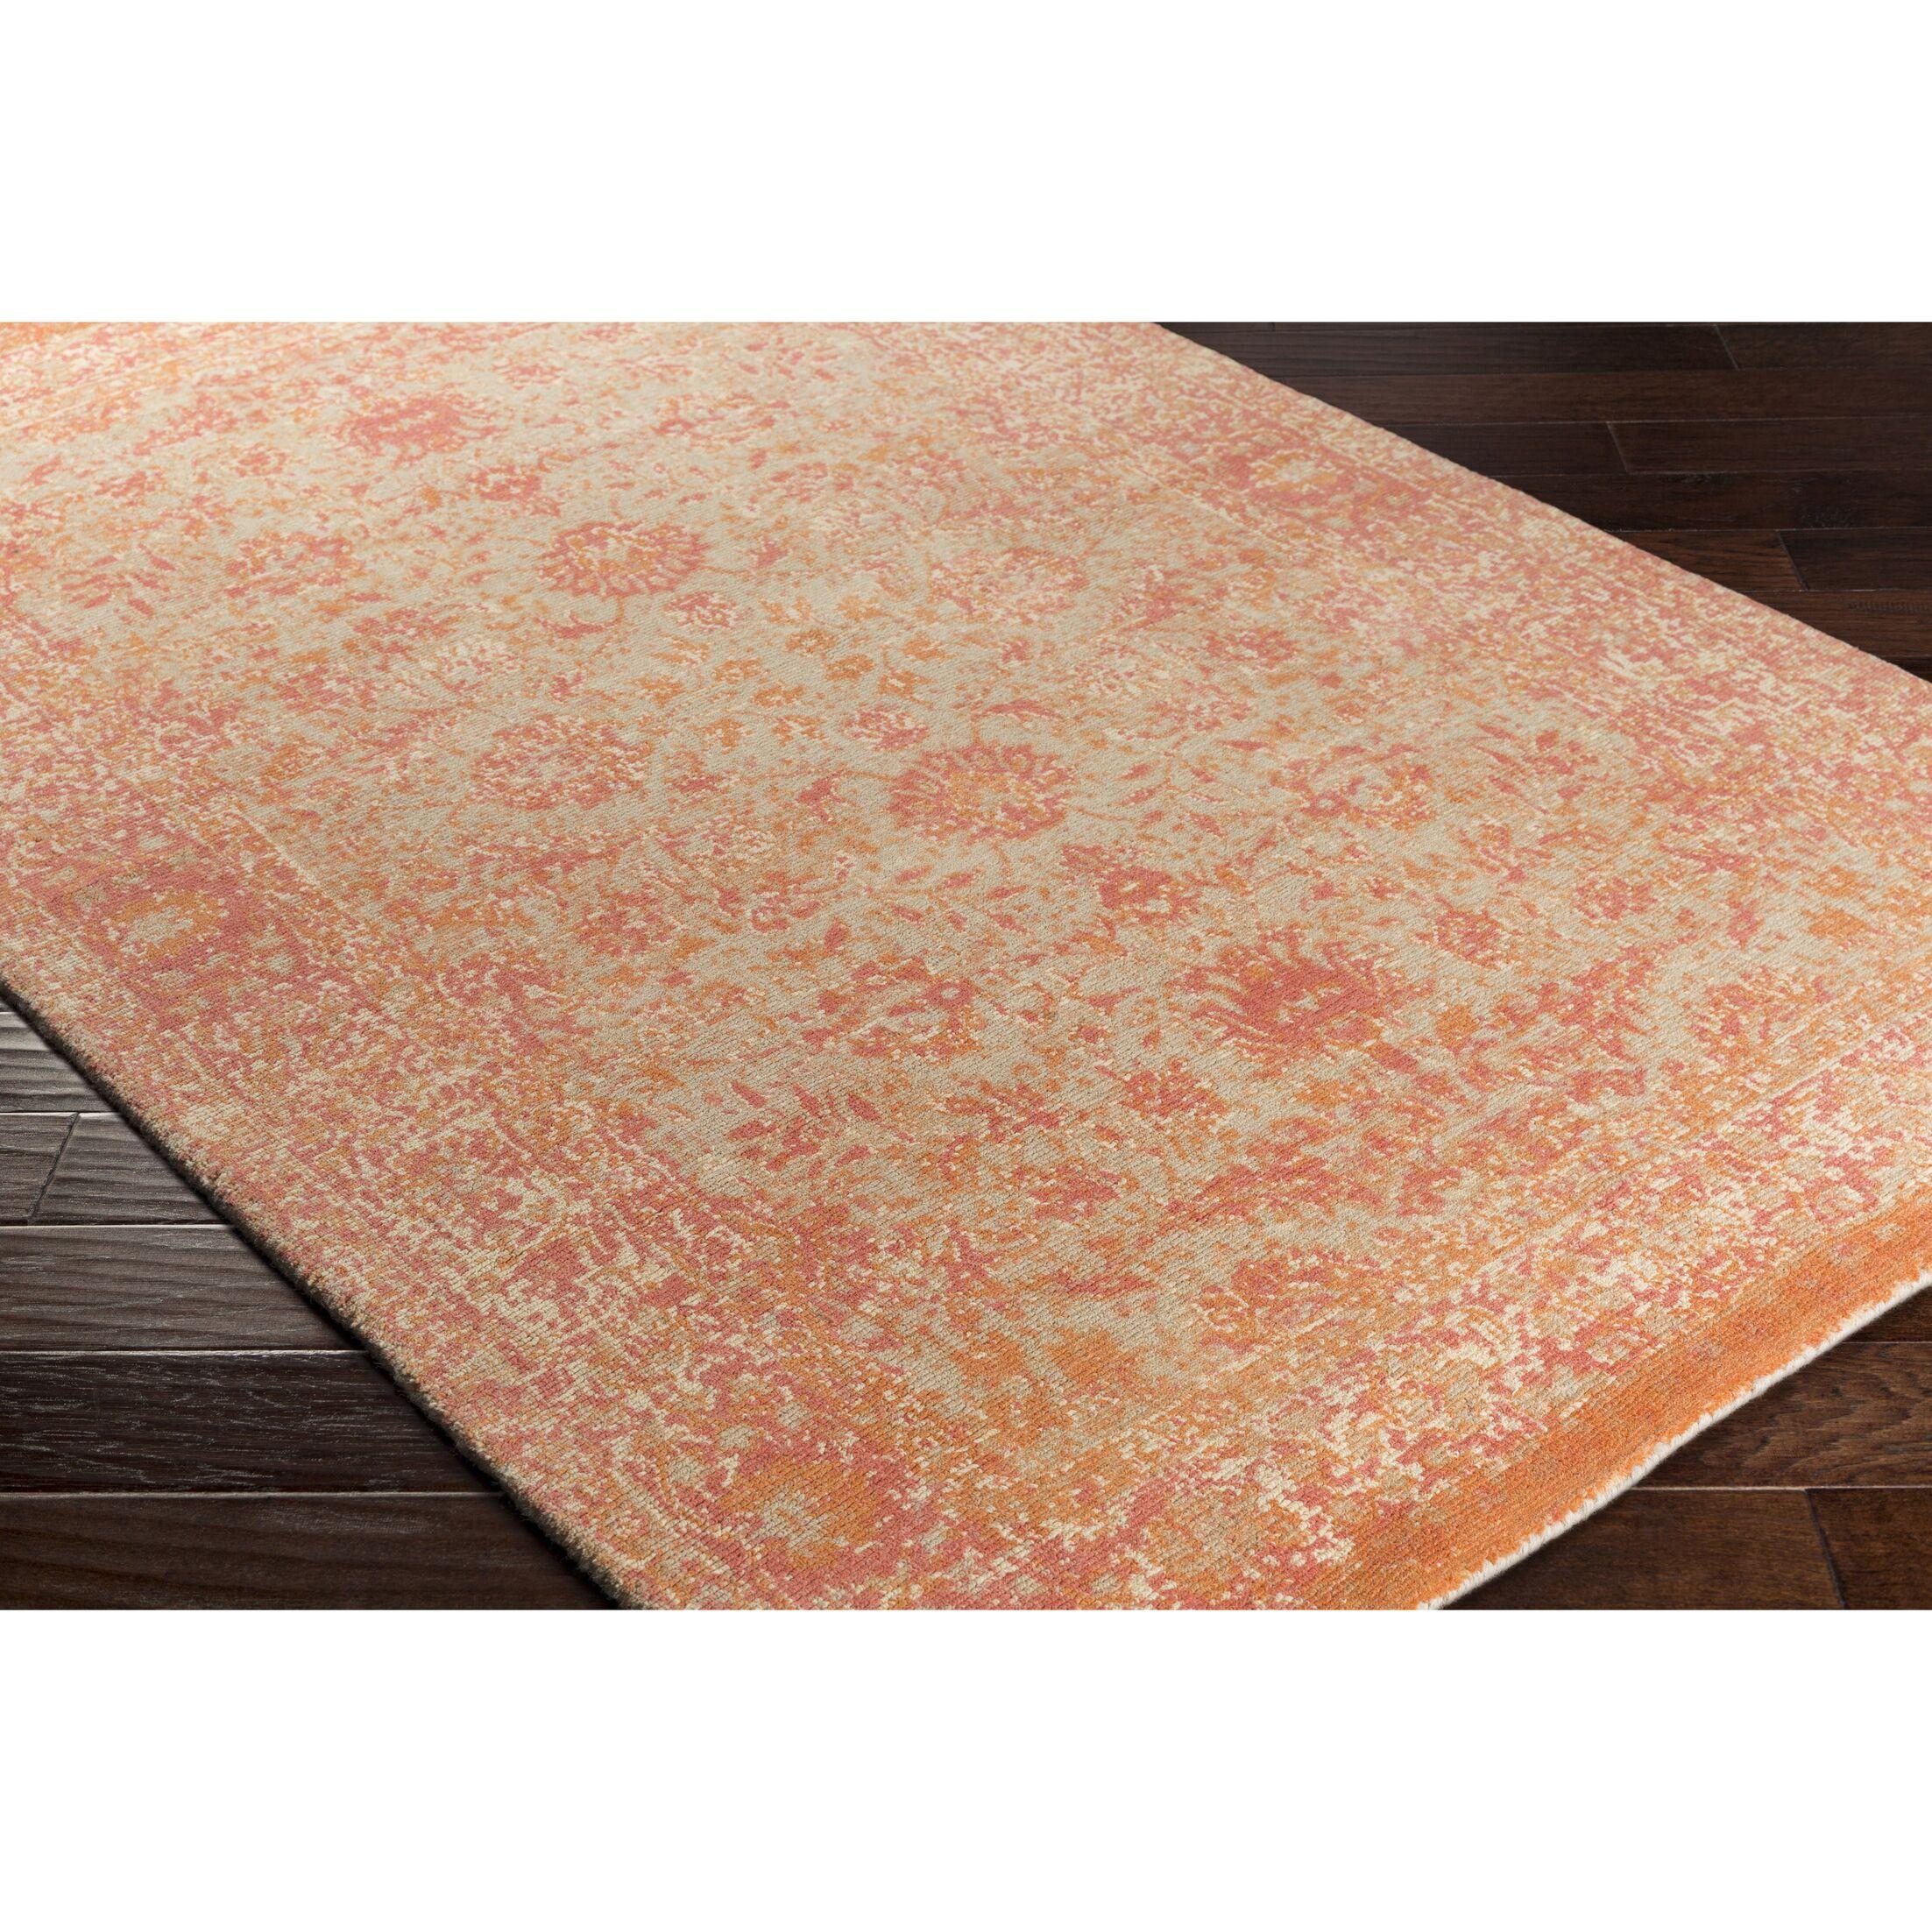 Anselma Hand-Loomed Khaki/Pink Area Rug Rug Size: Rectangle 8' x 10'